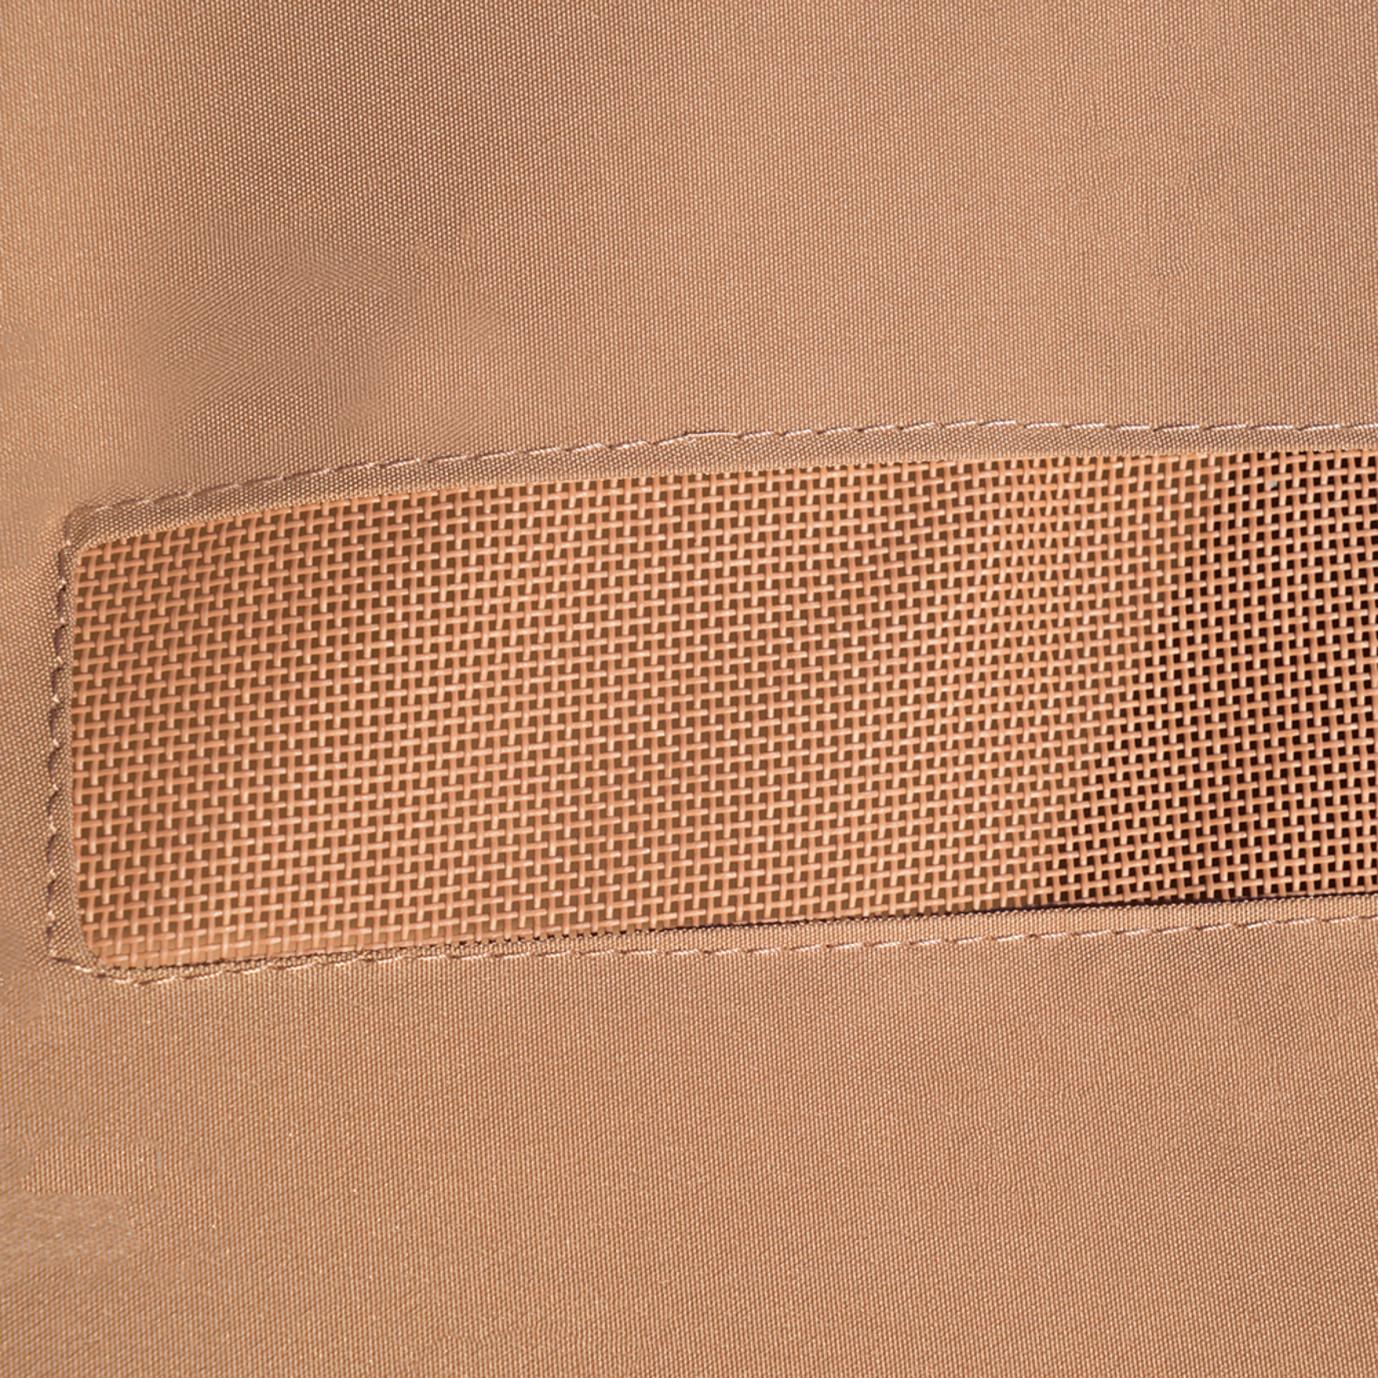 Portofino® Zipper Furniture Covers for 6pc Sofa Sectional